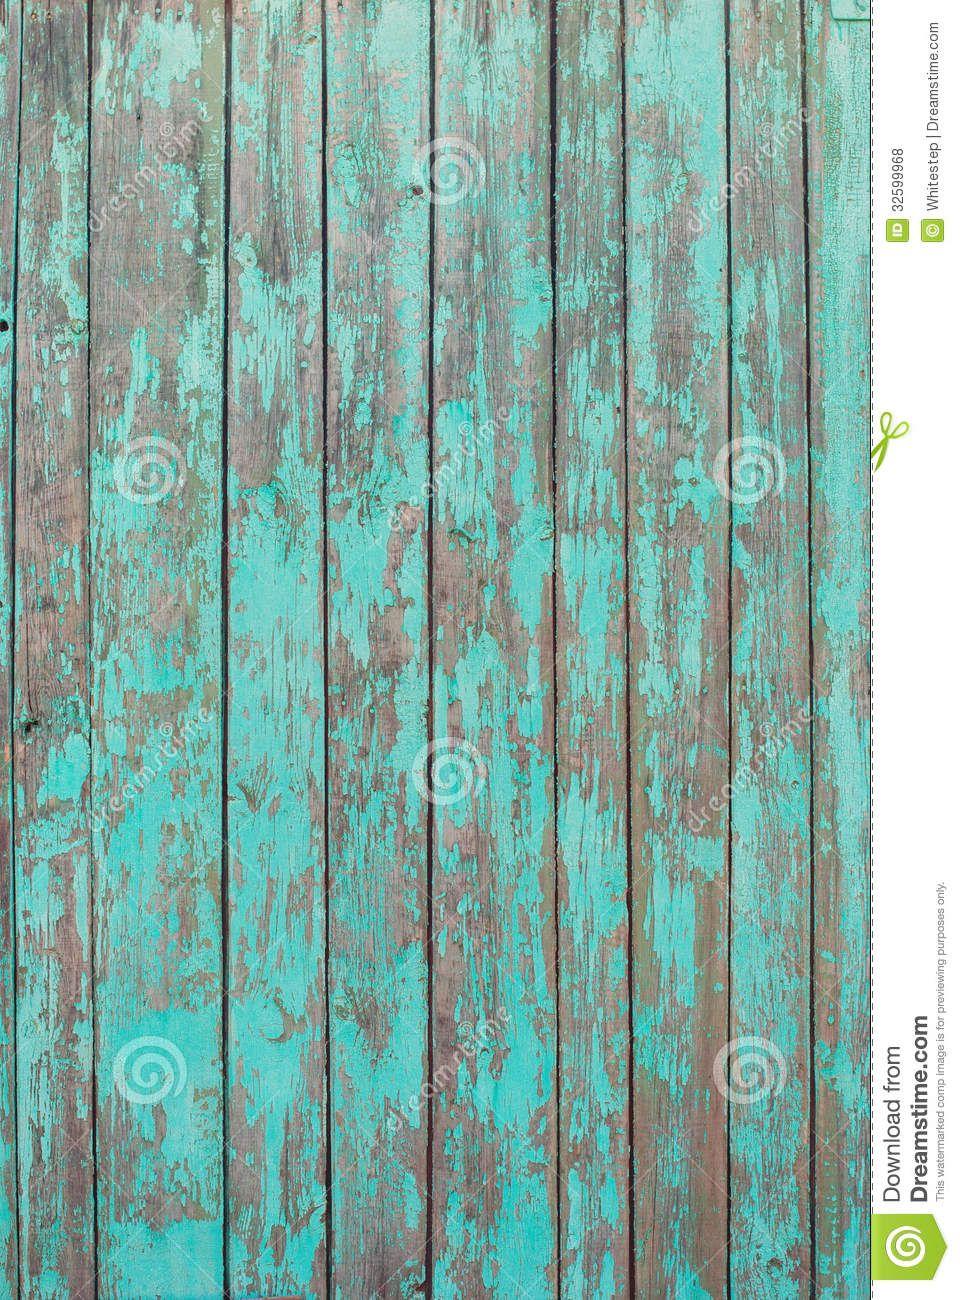 Old Painted Wood Google Search Photographie Fond Ecran Ecran